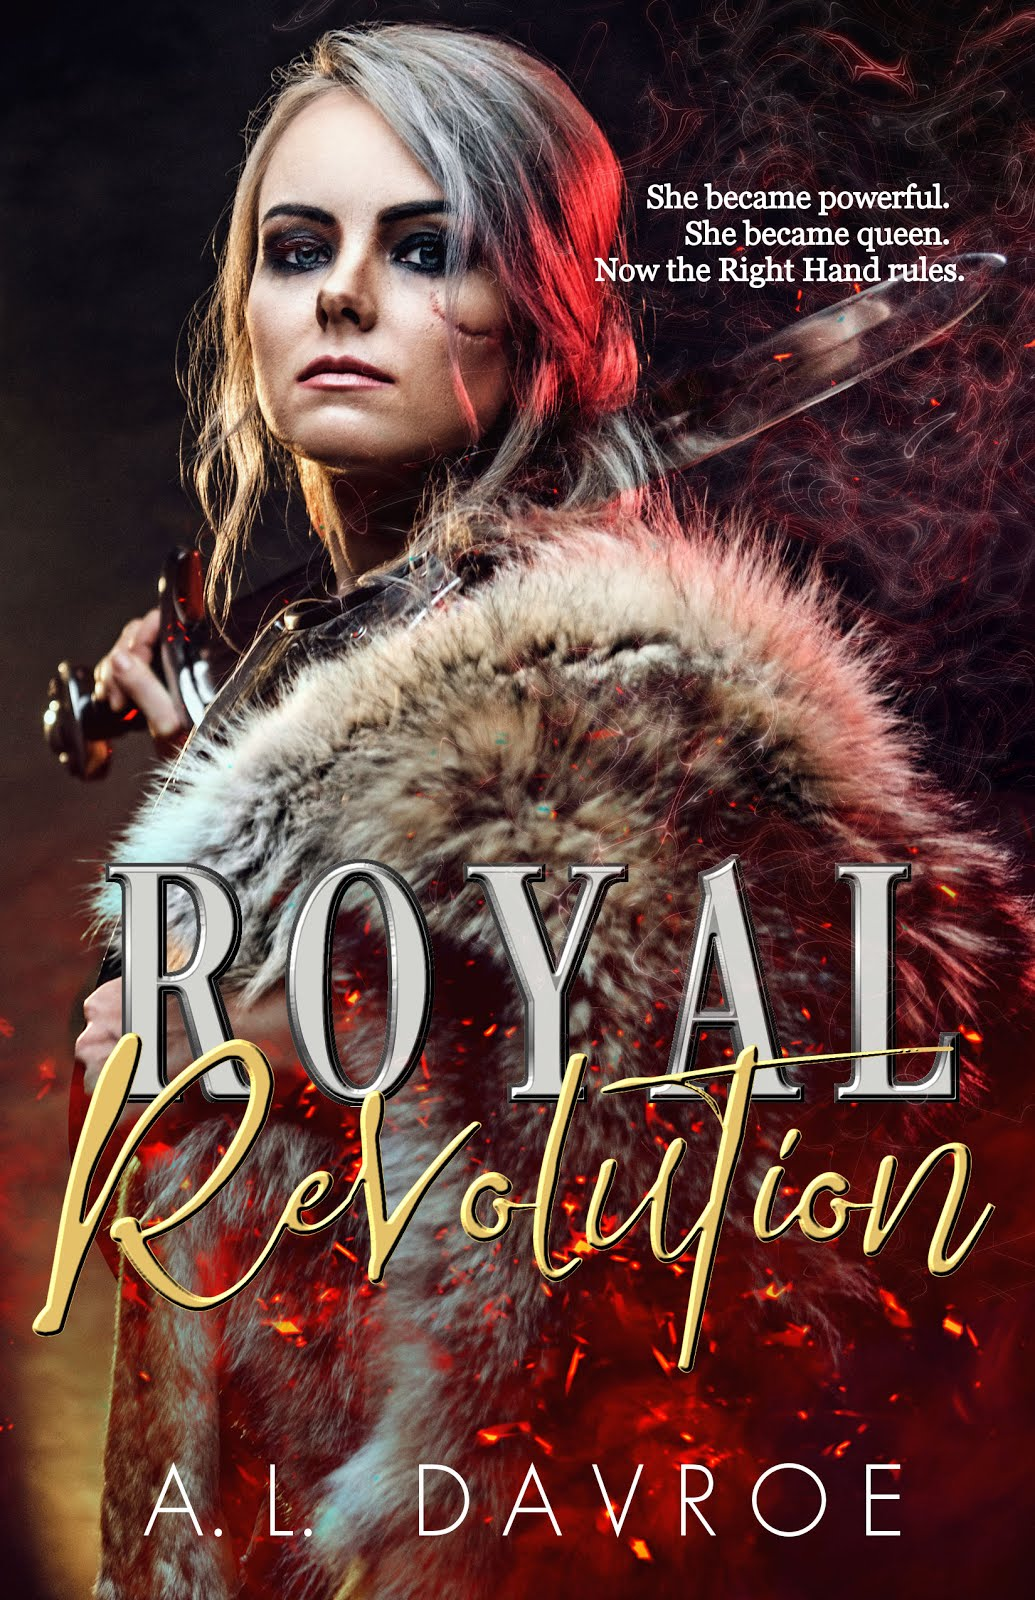 Buy Royal Revolution